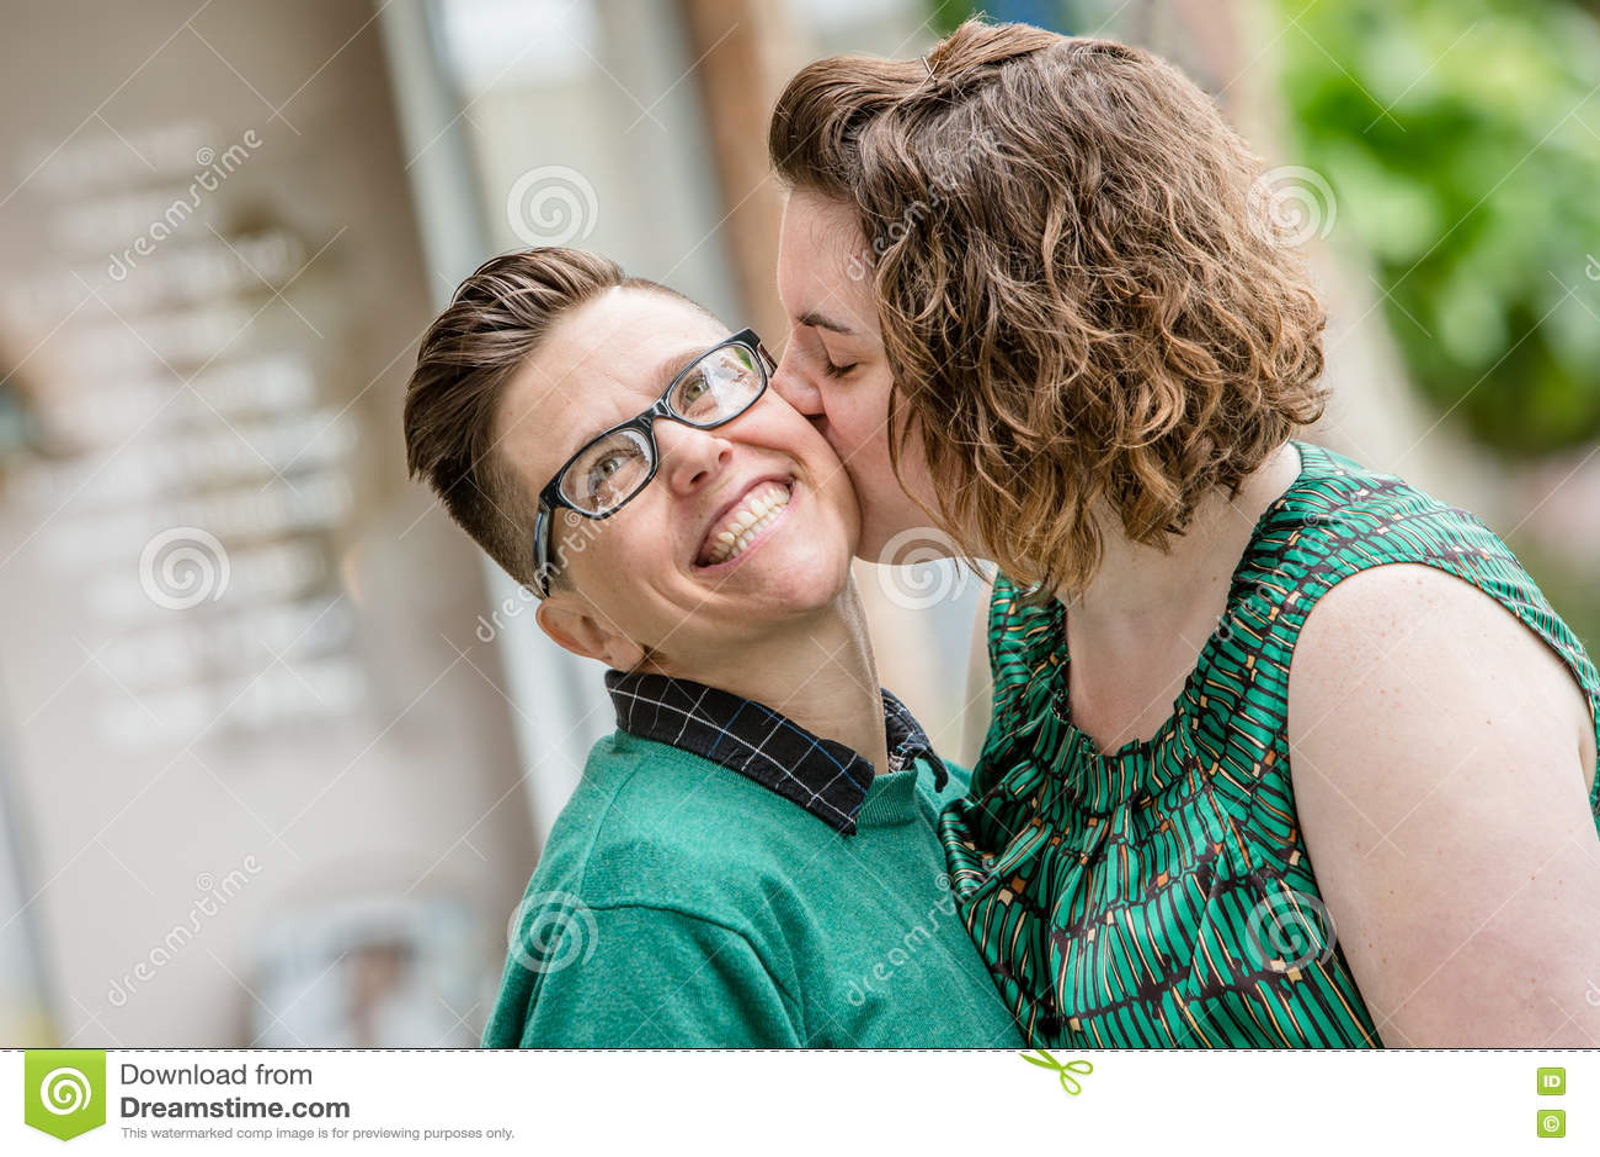 Lesbian couple kissing outdoors